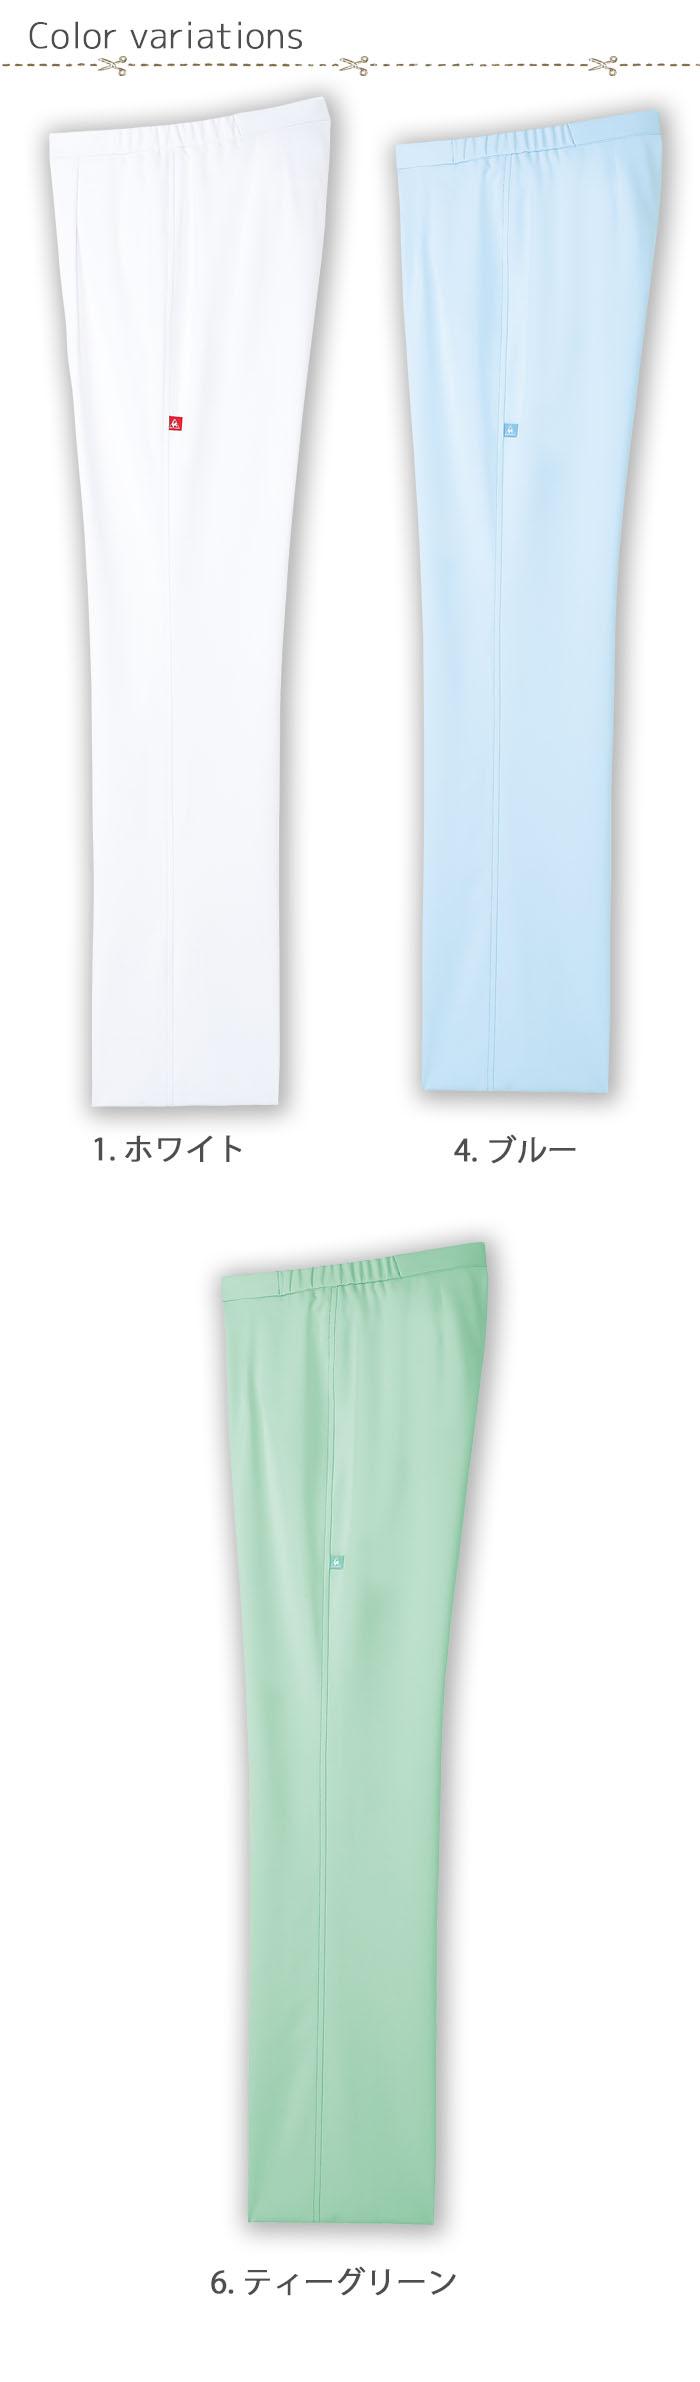 UQM2023 3色のパンツ 色展開画像